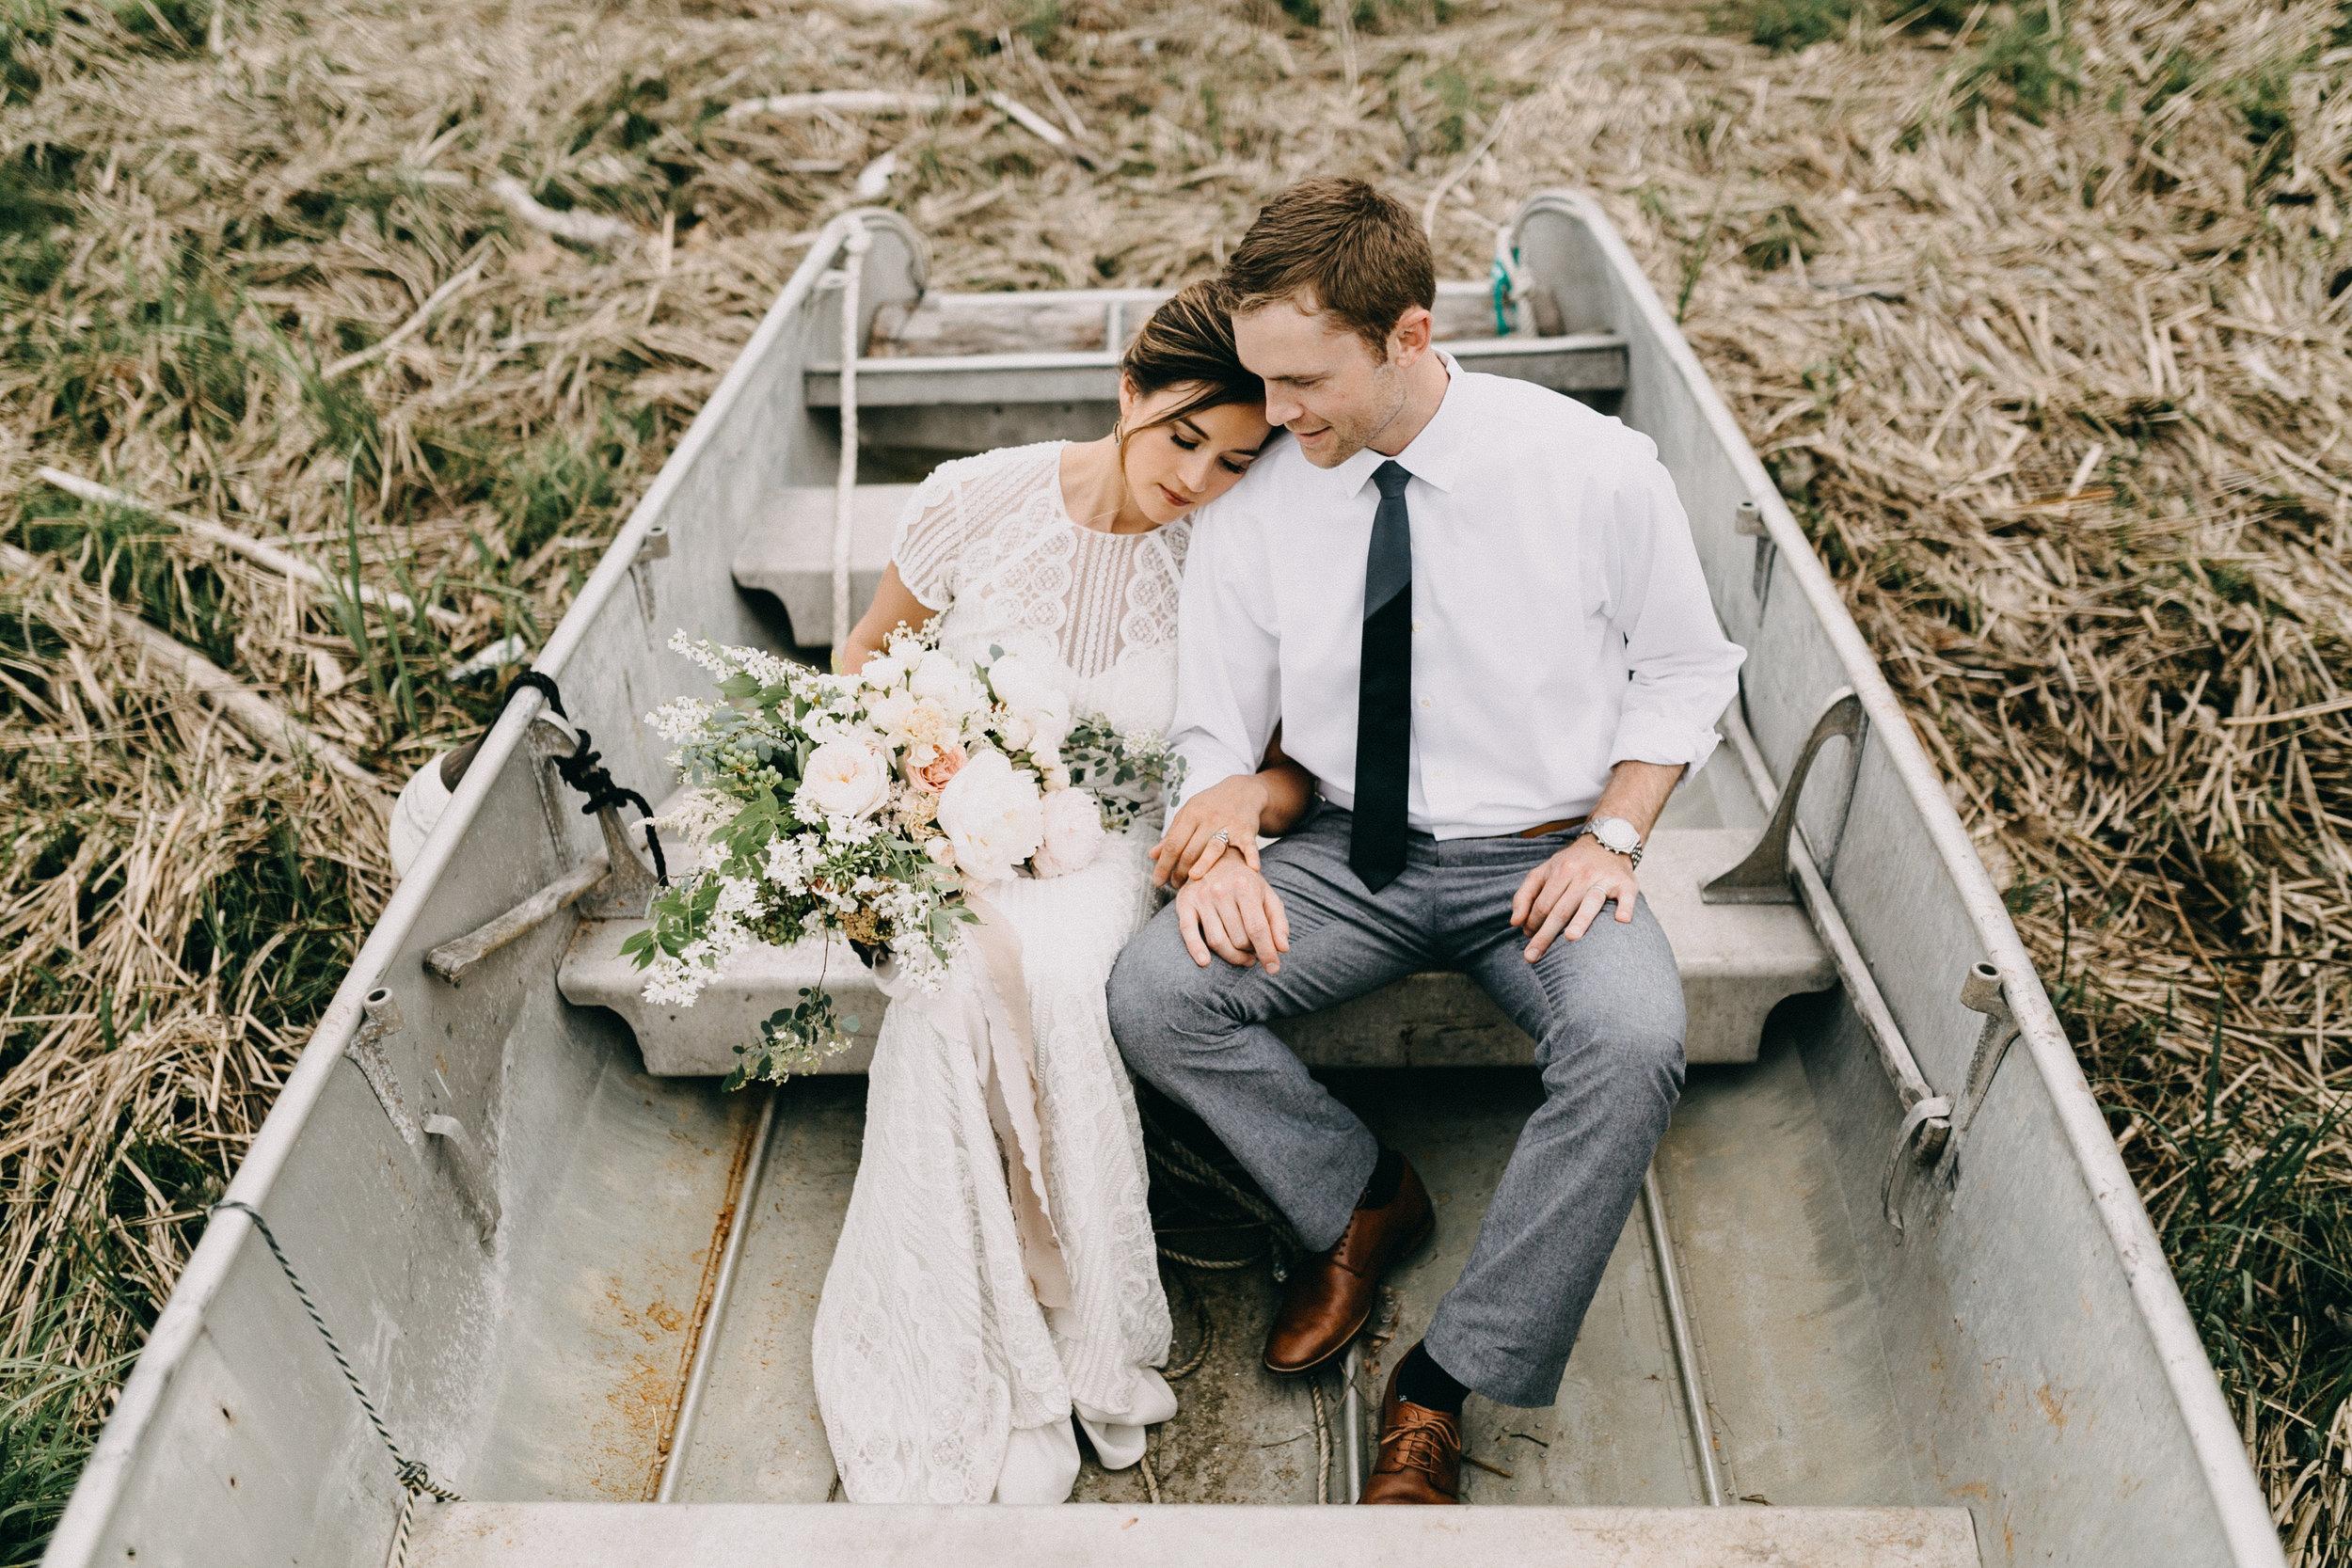 Watershed-Floral-Maine-Maritime-Wedding-Bridal-Bouquet-Centerpieces-0154.jpg